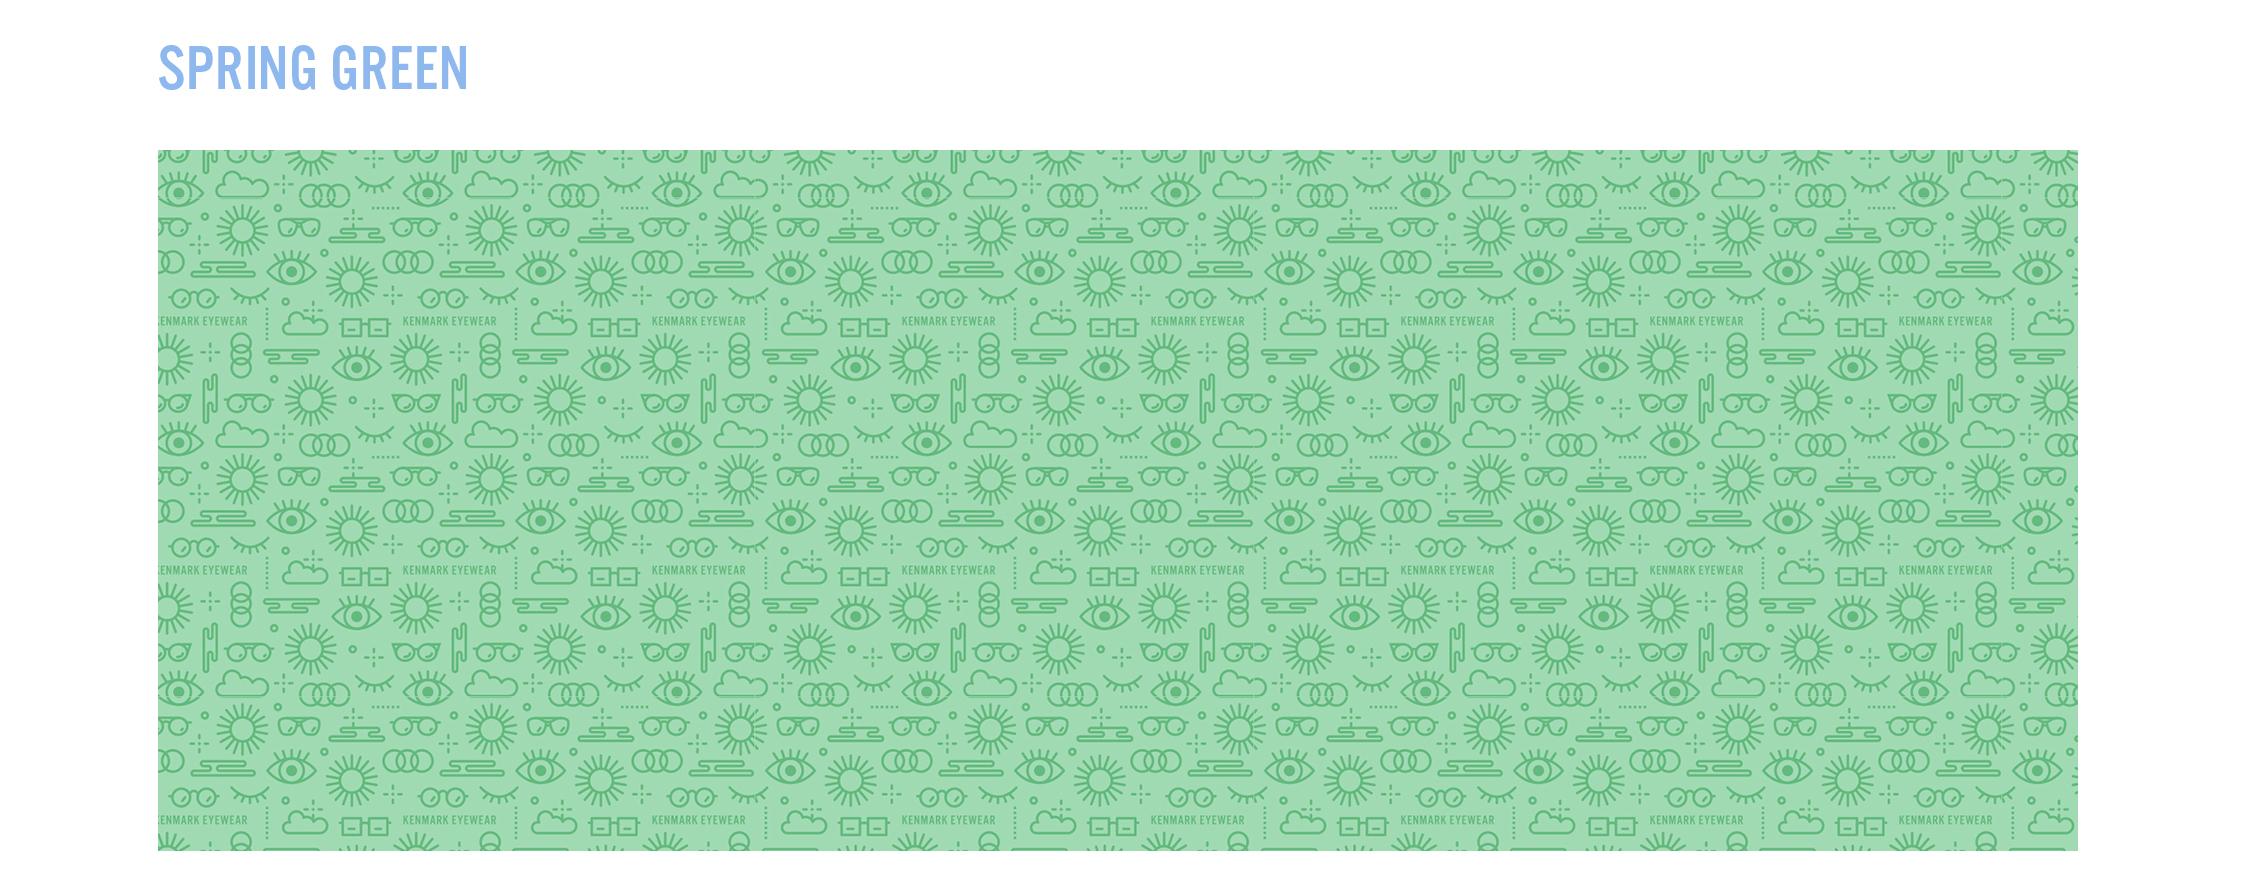 Blog Layout_Spring Green.jpg